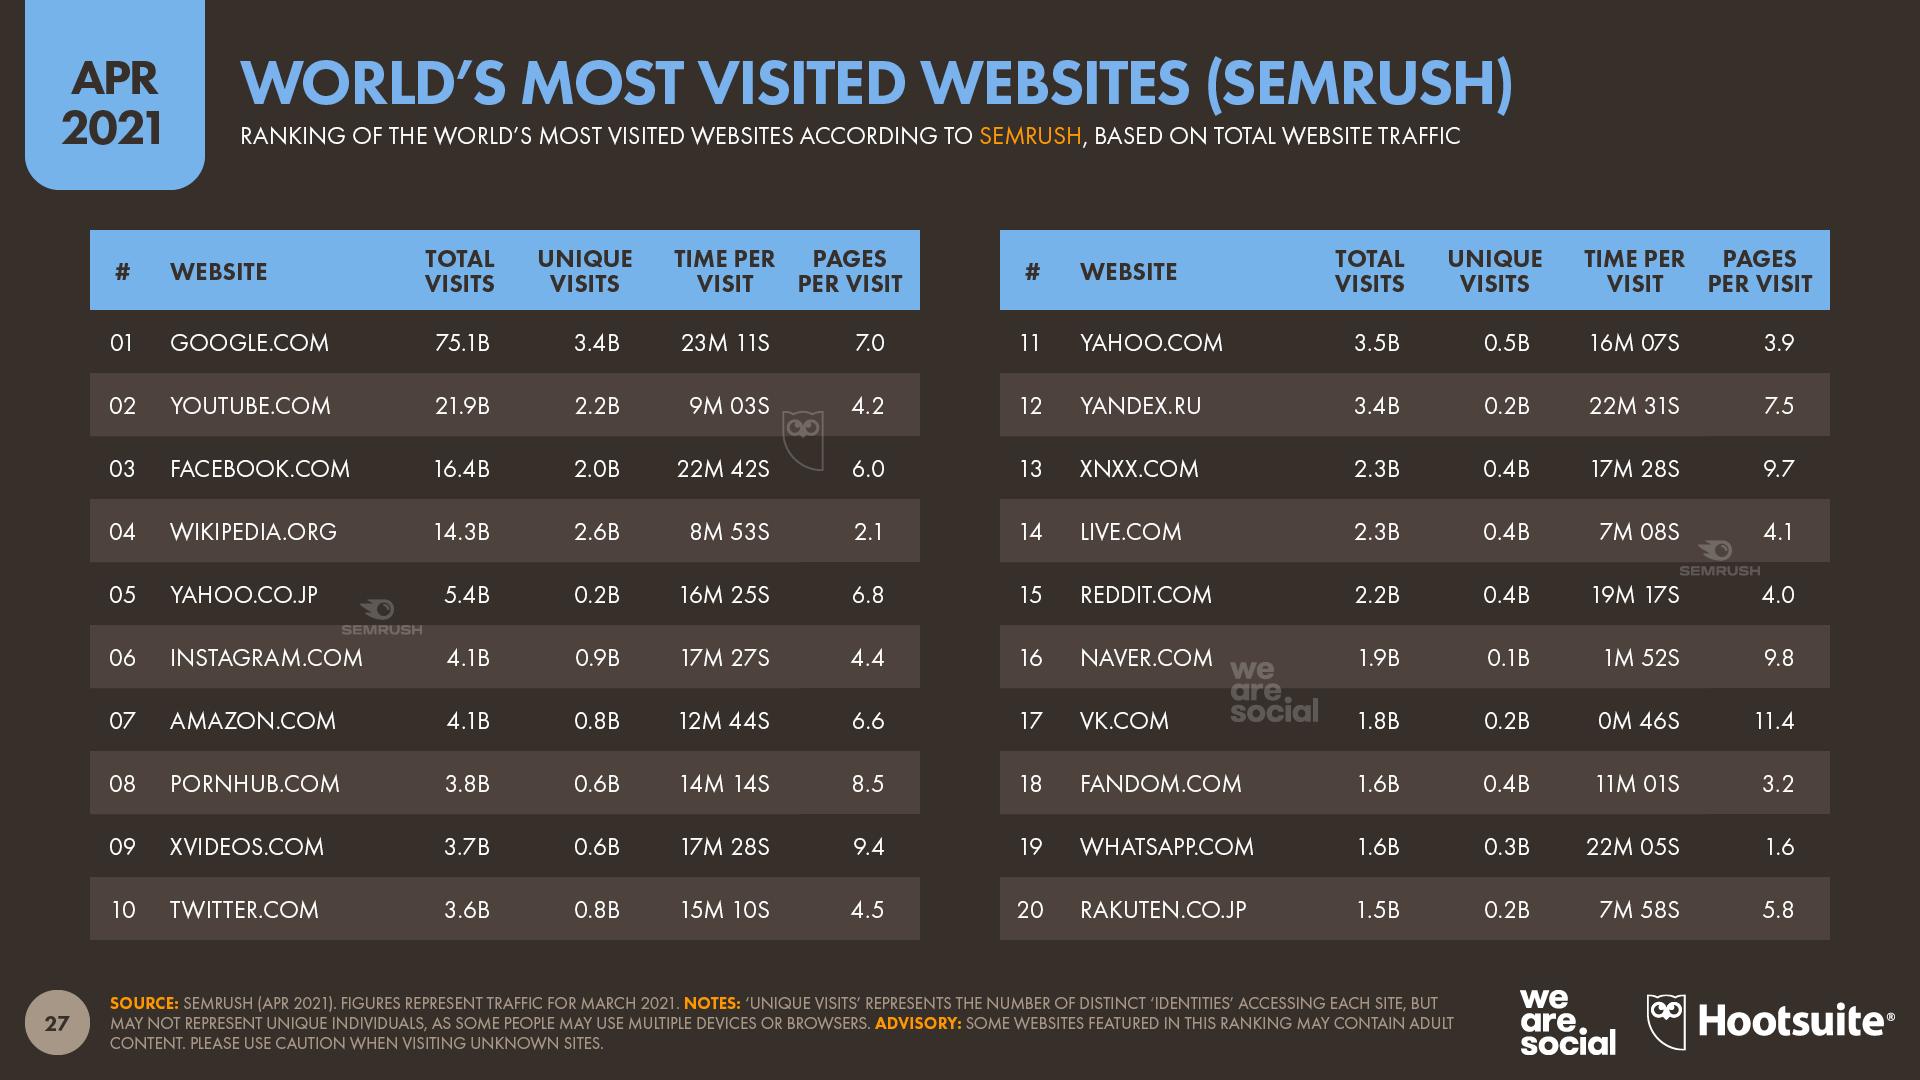 World's Top Websites According to Semrush April 2021 DataReportal